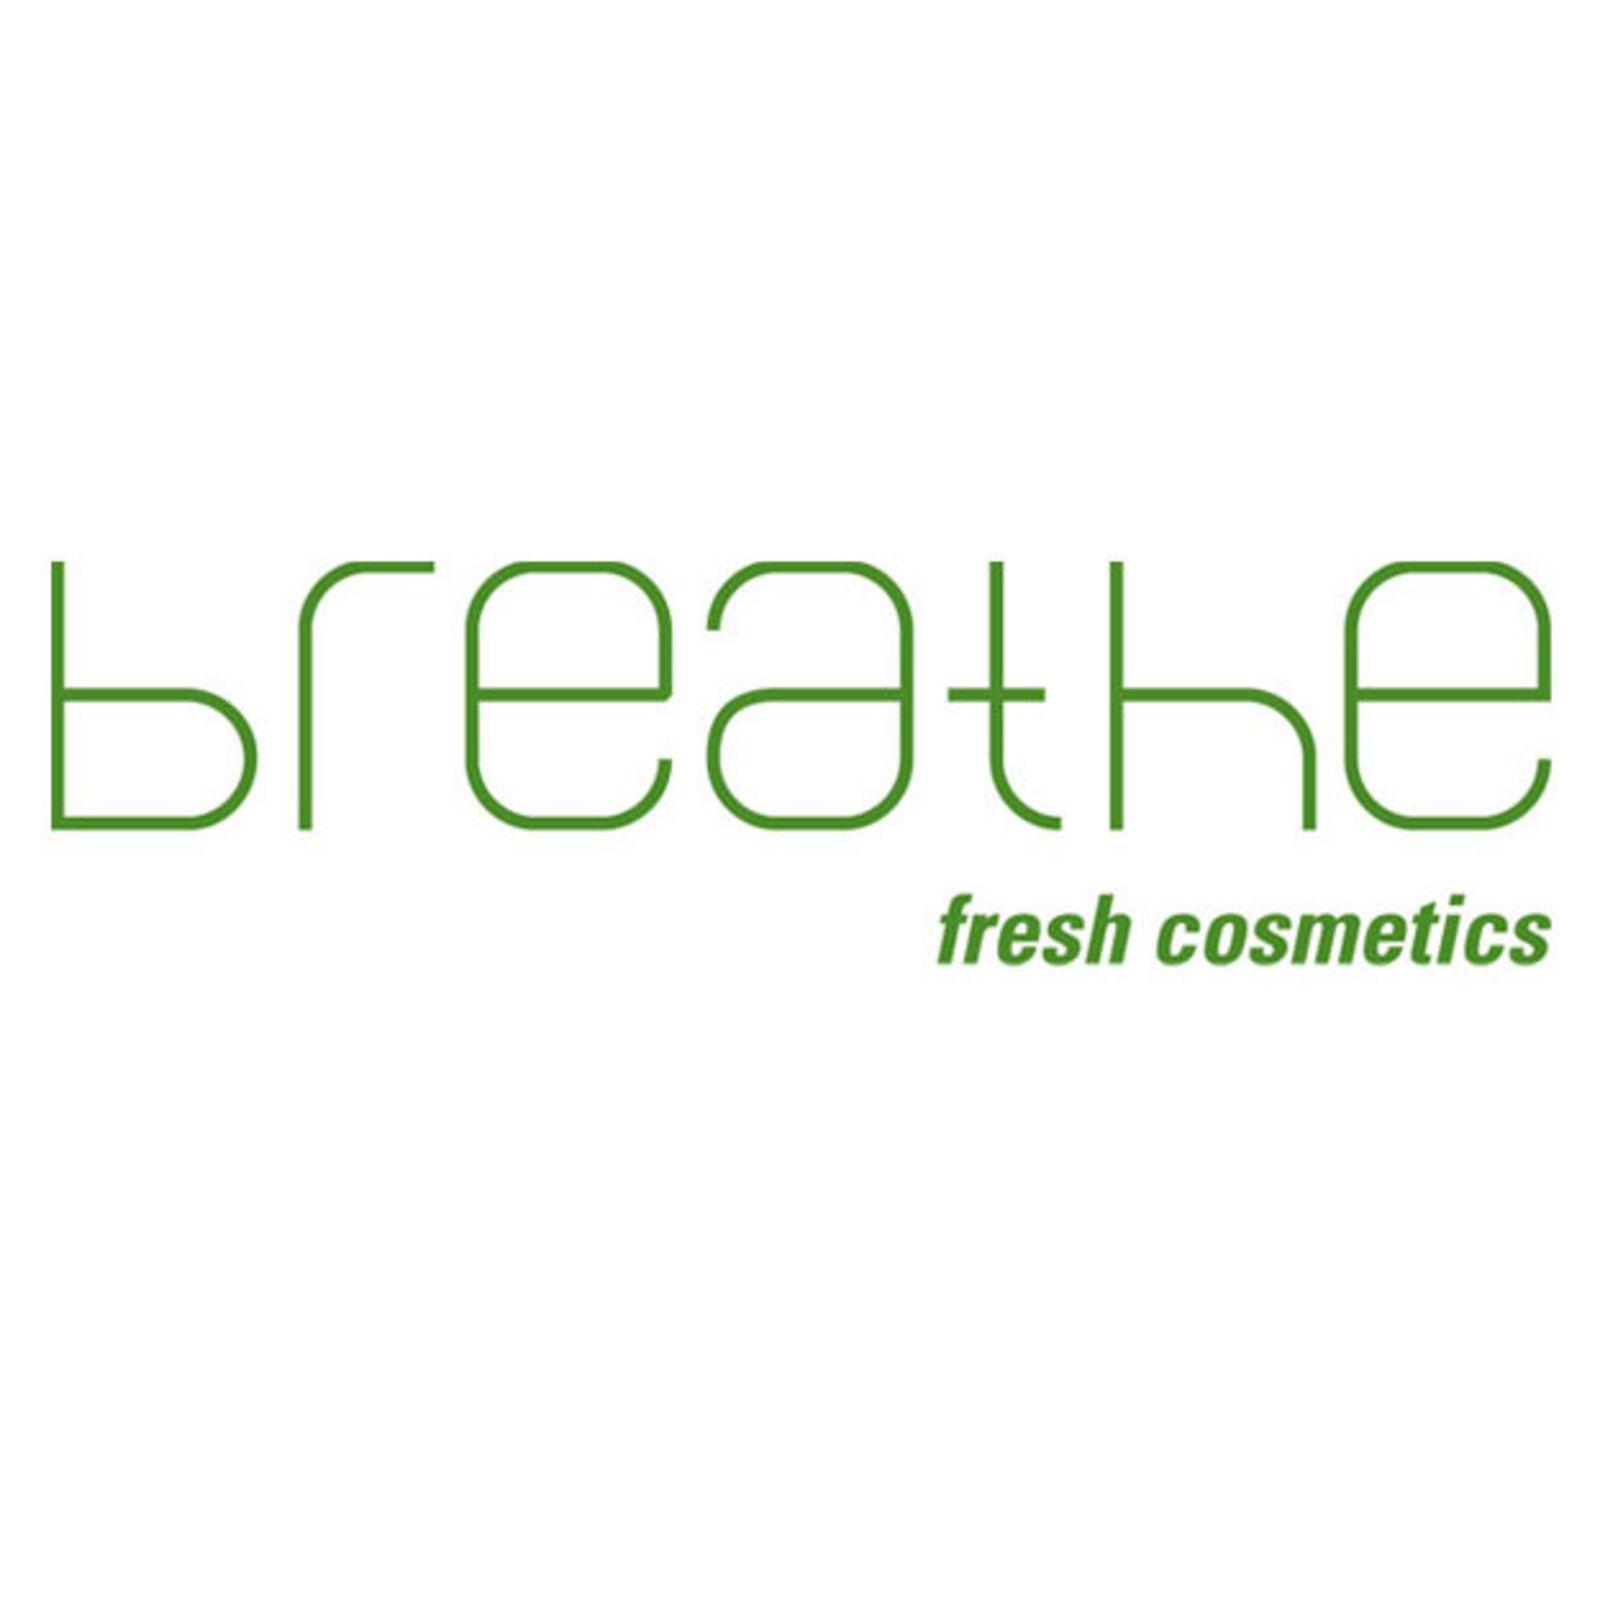 BREATHE fresh cosmetics in Berlin (Bild 1)